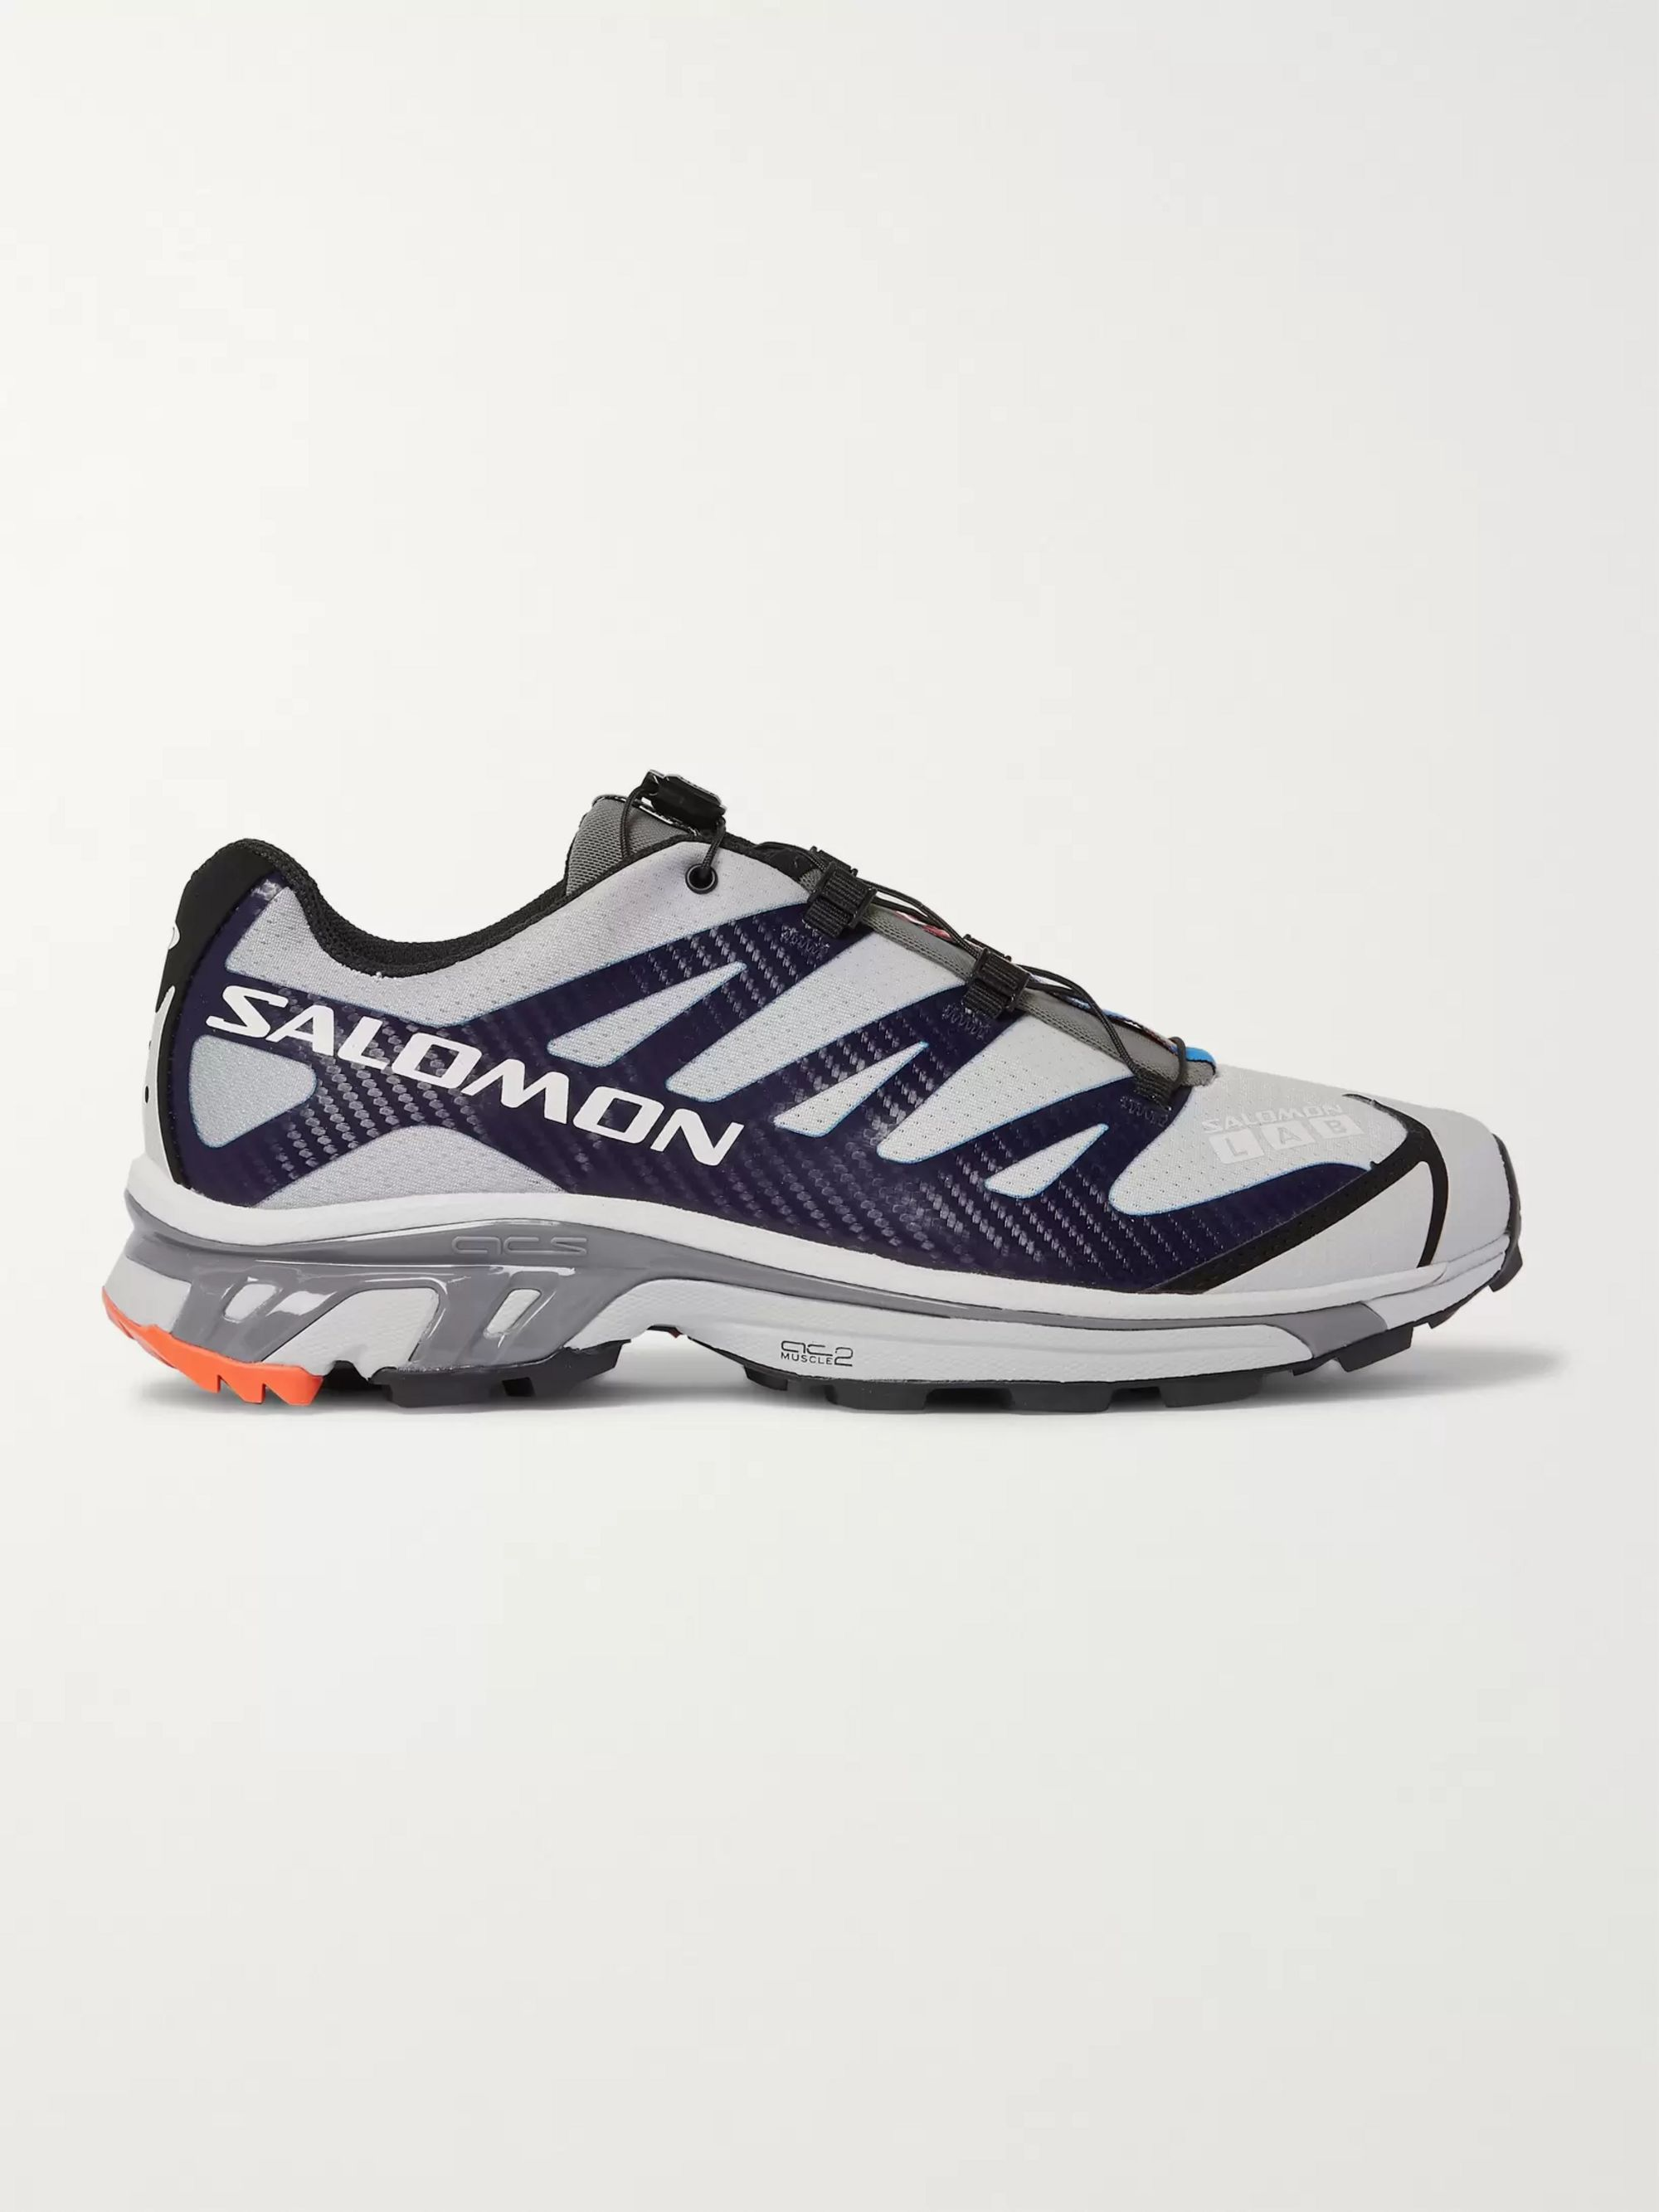 S/Lab Xt 4 Adv Running Sneakers by Salomon